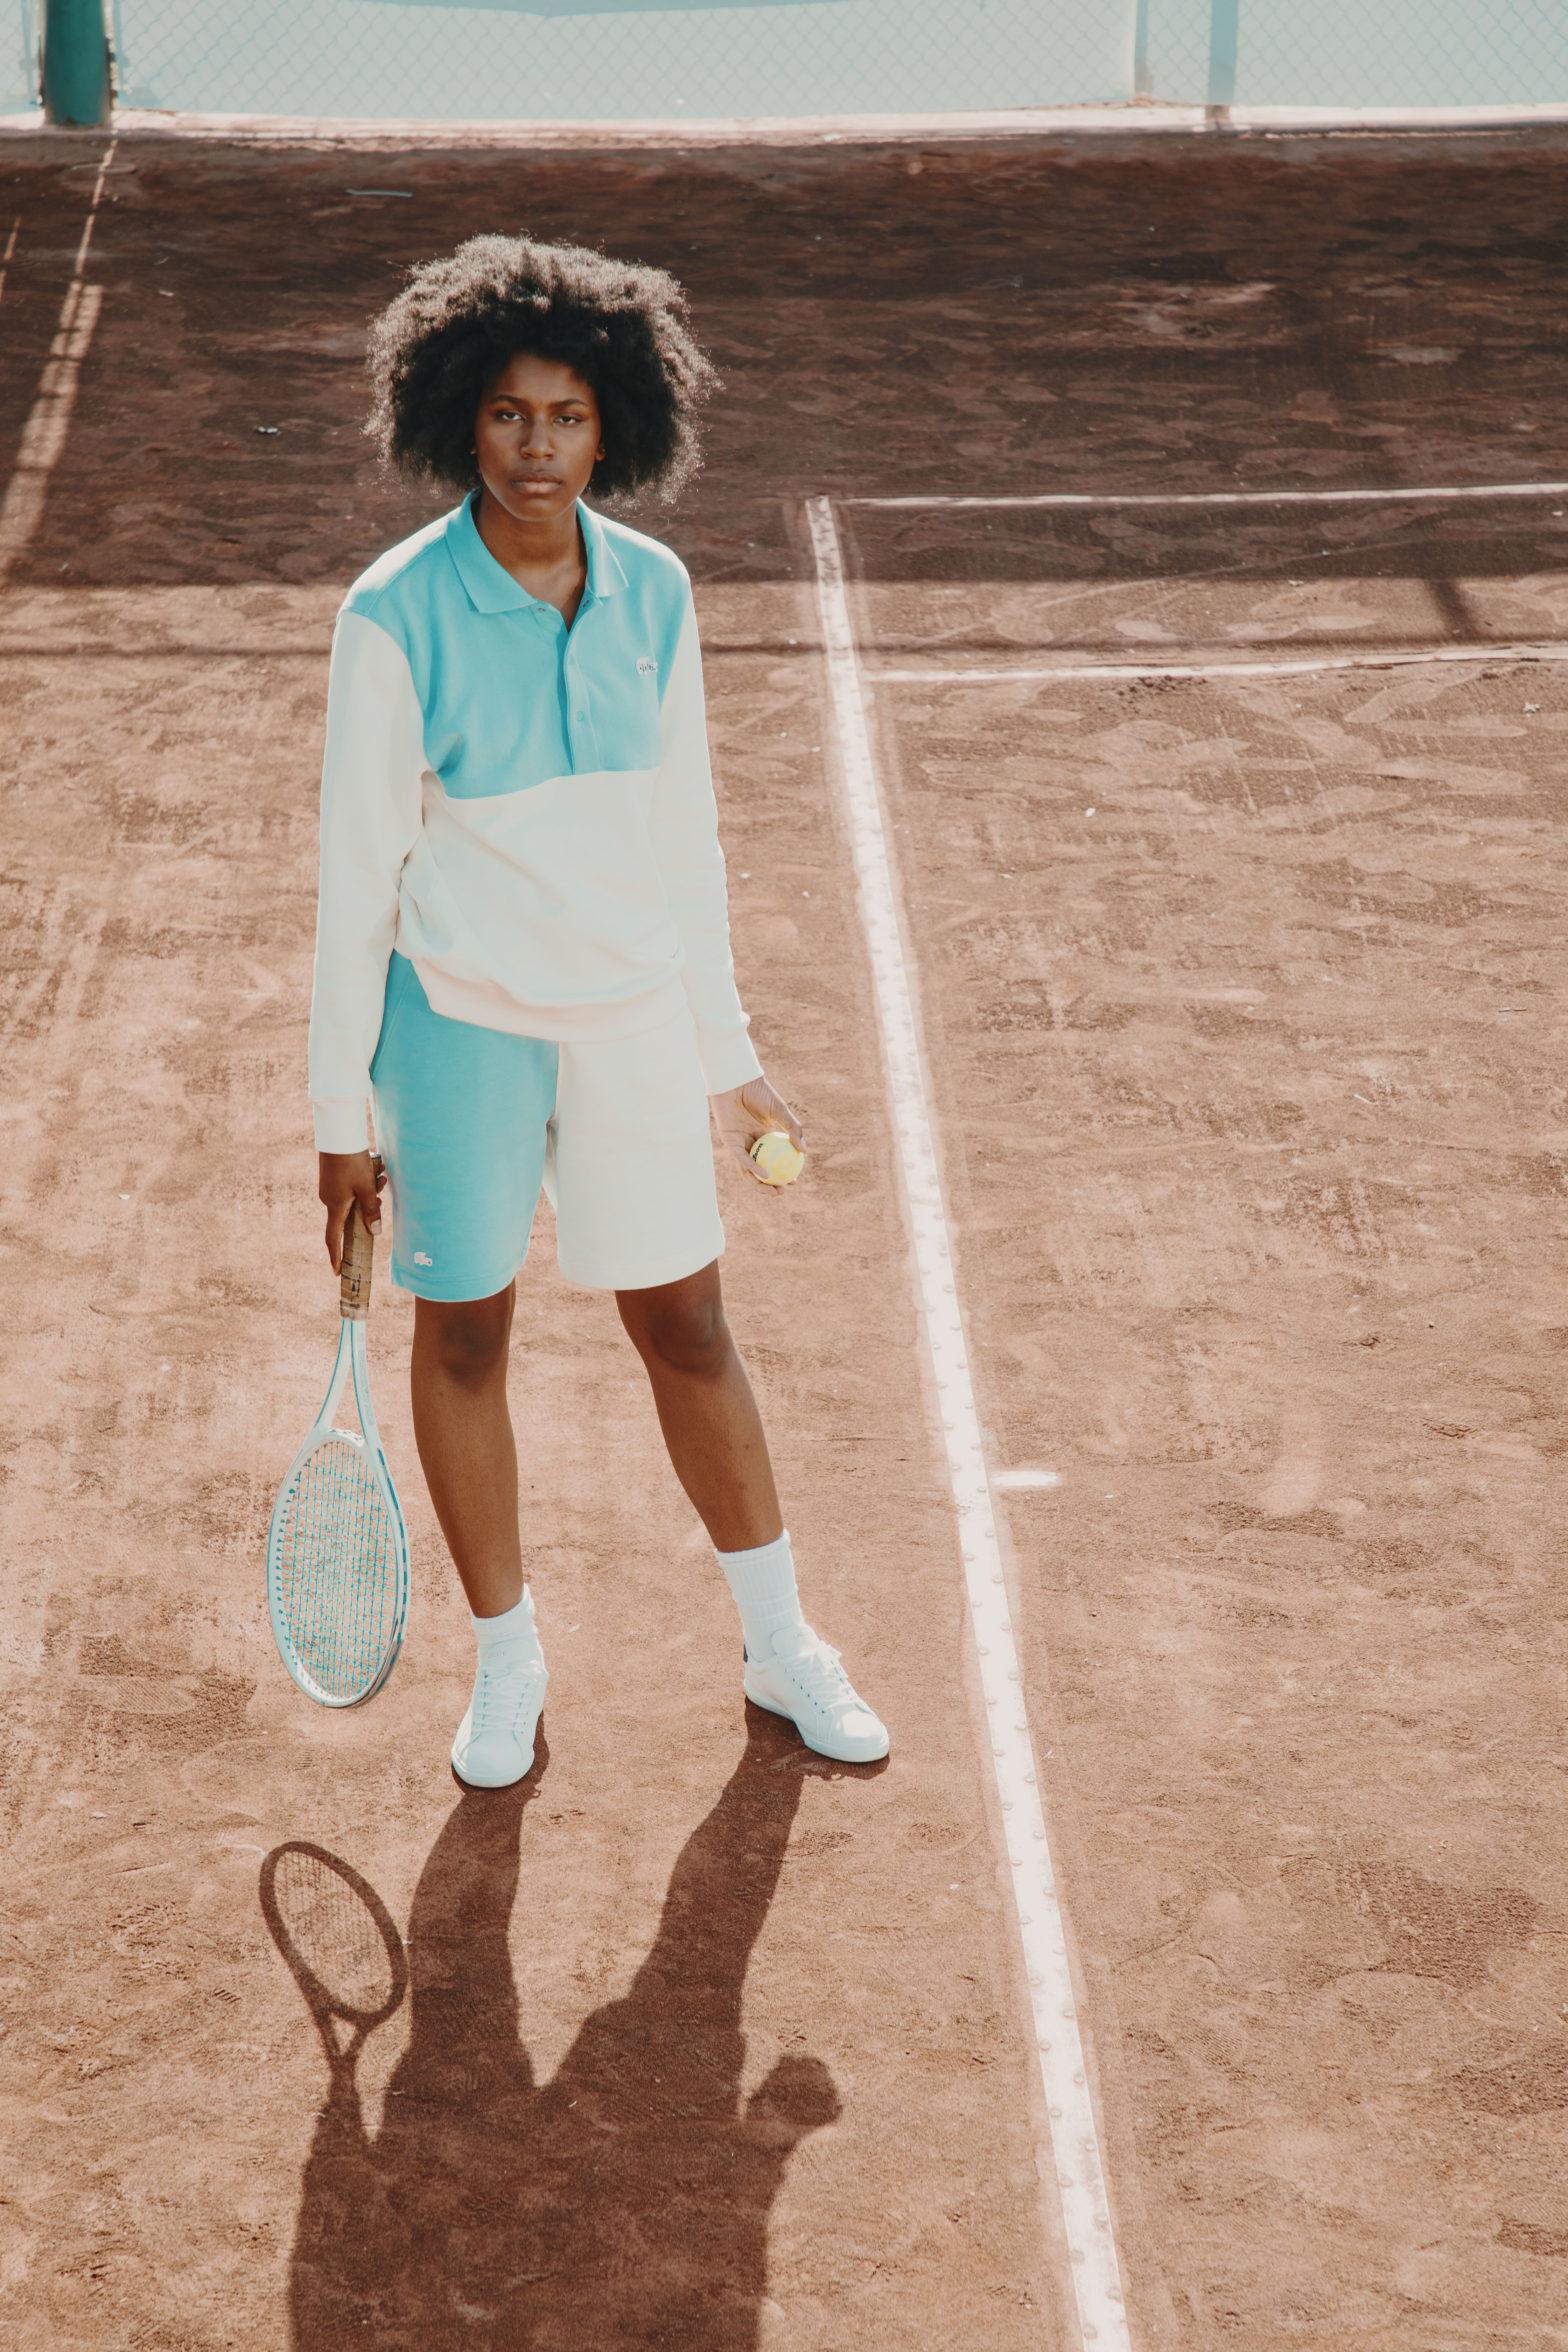 My Tennis Aesthetic Caught On Seasonless